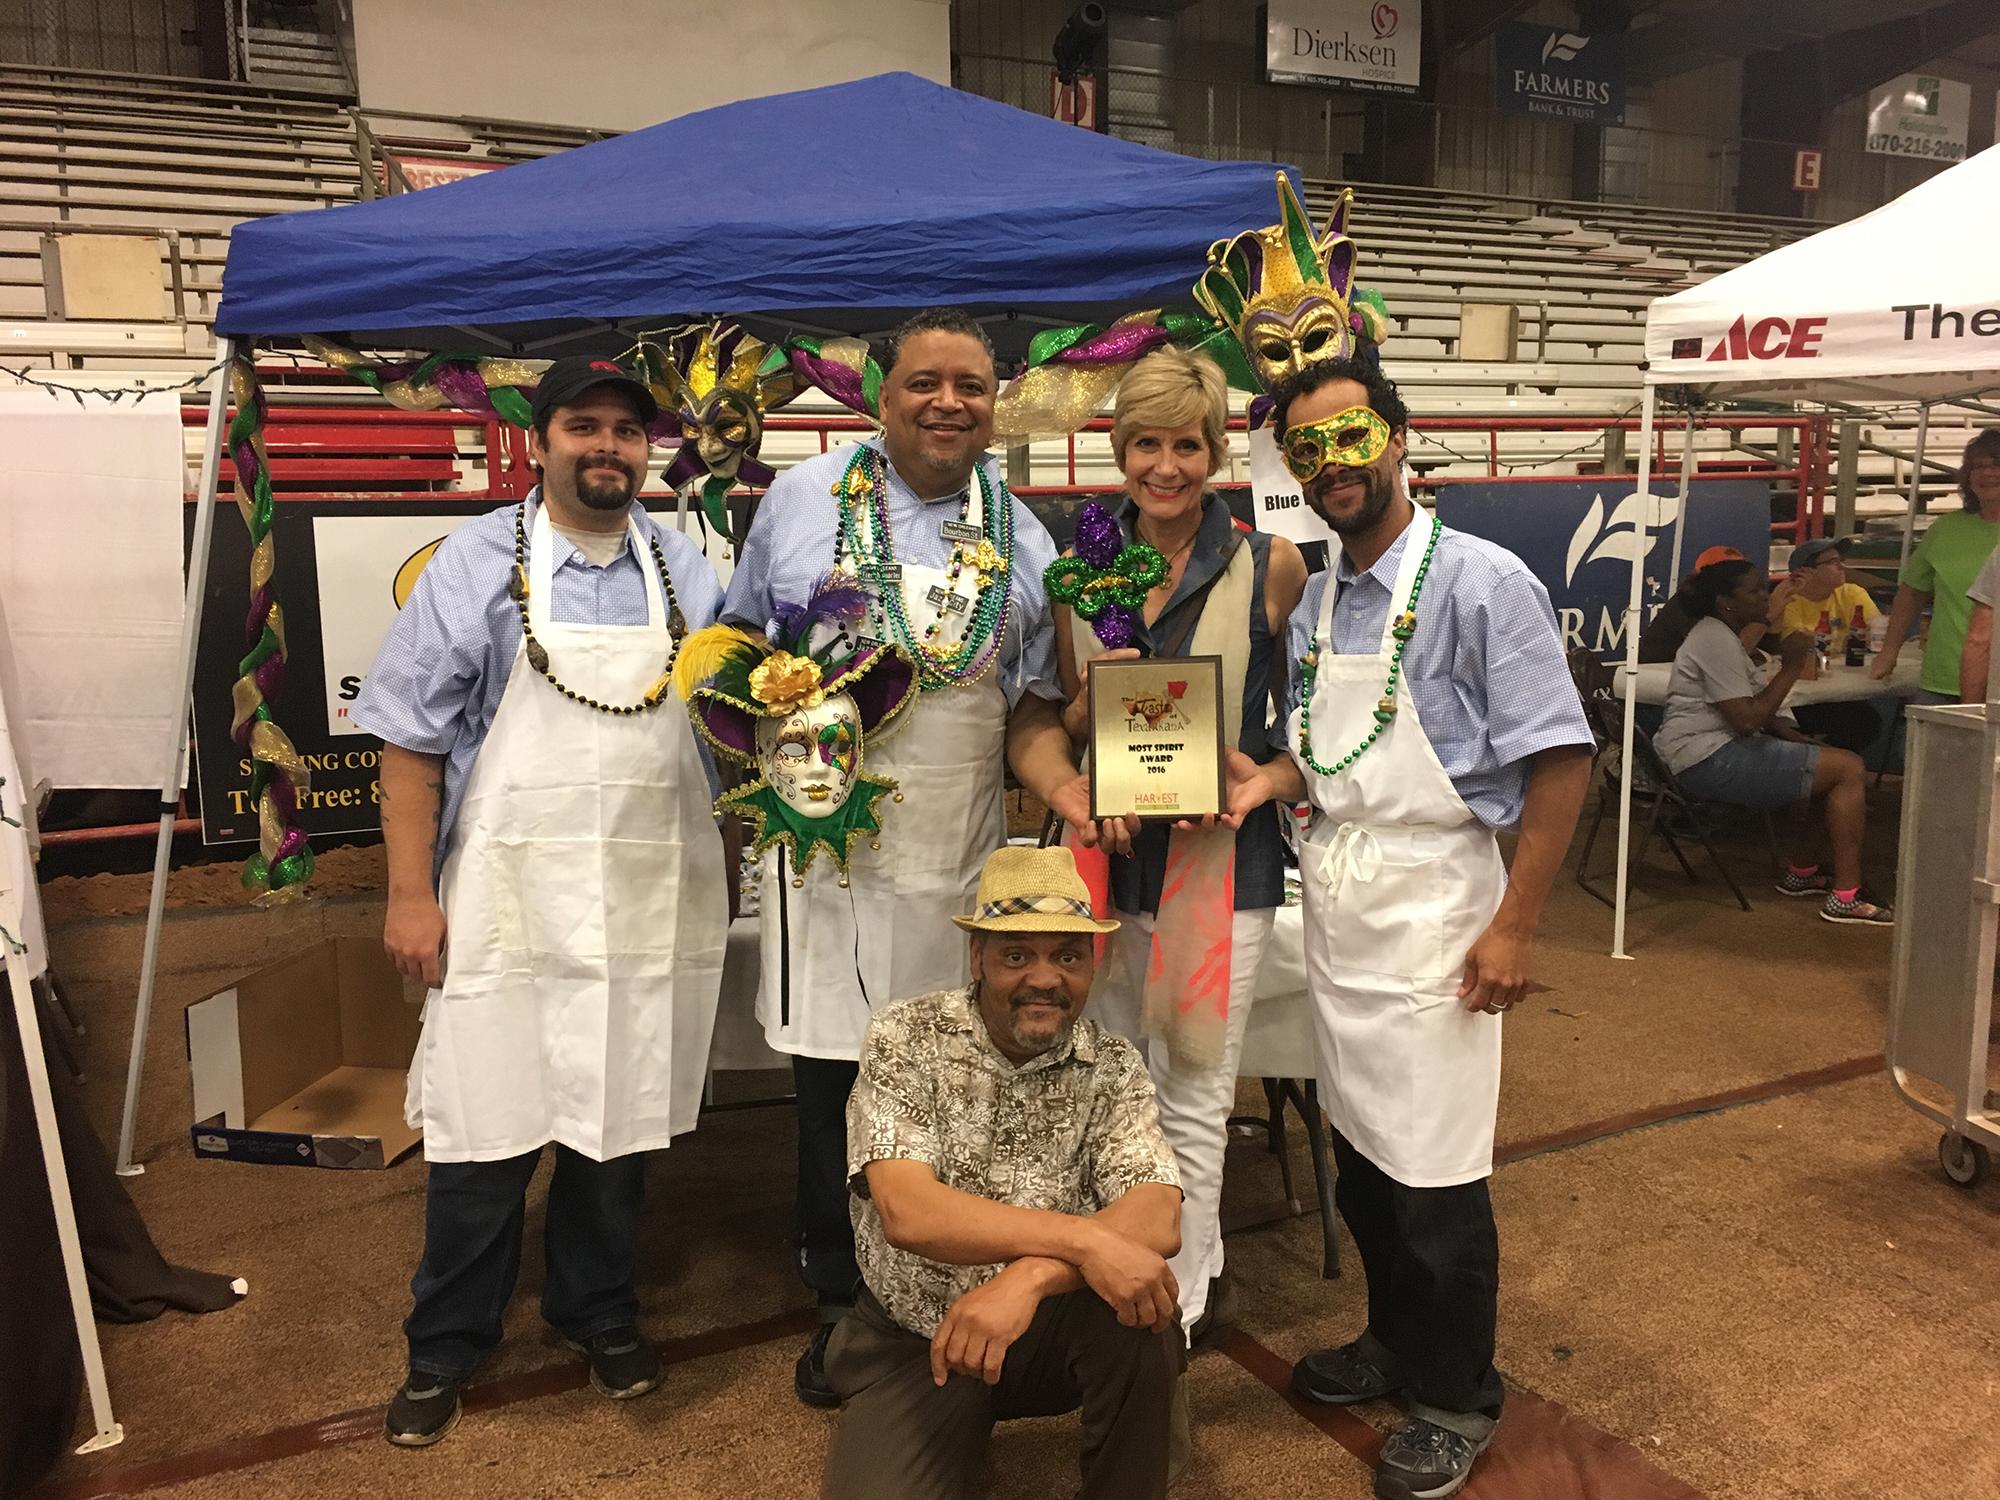 Mclarty Ford Texarkana >> Taste of Texarkana | Harvest Regional Food Bank